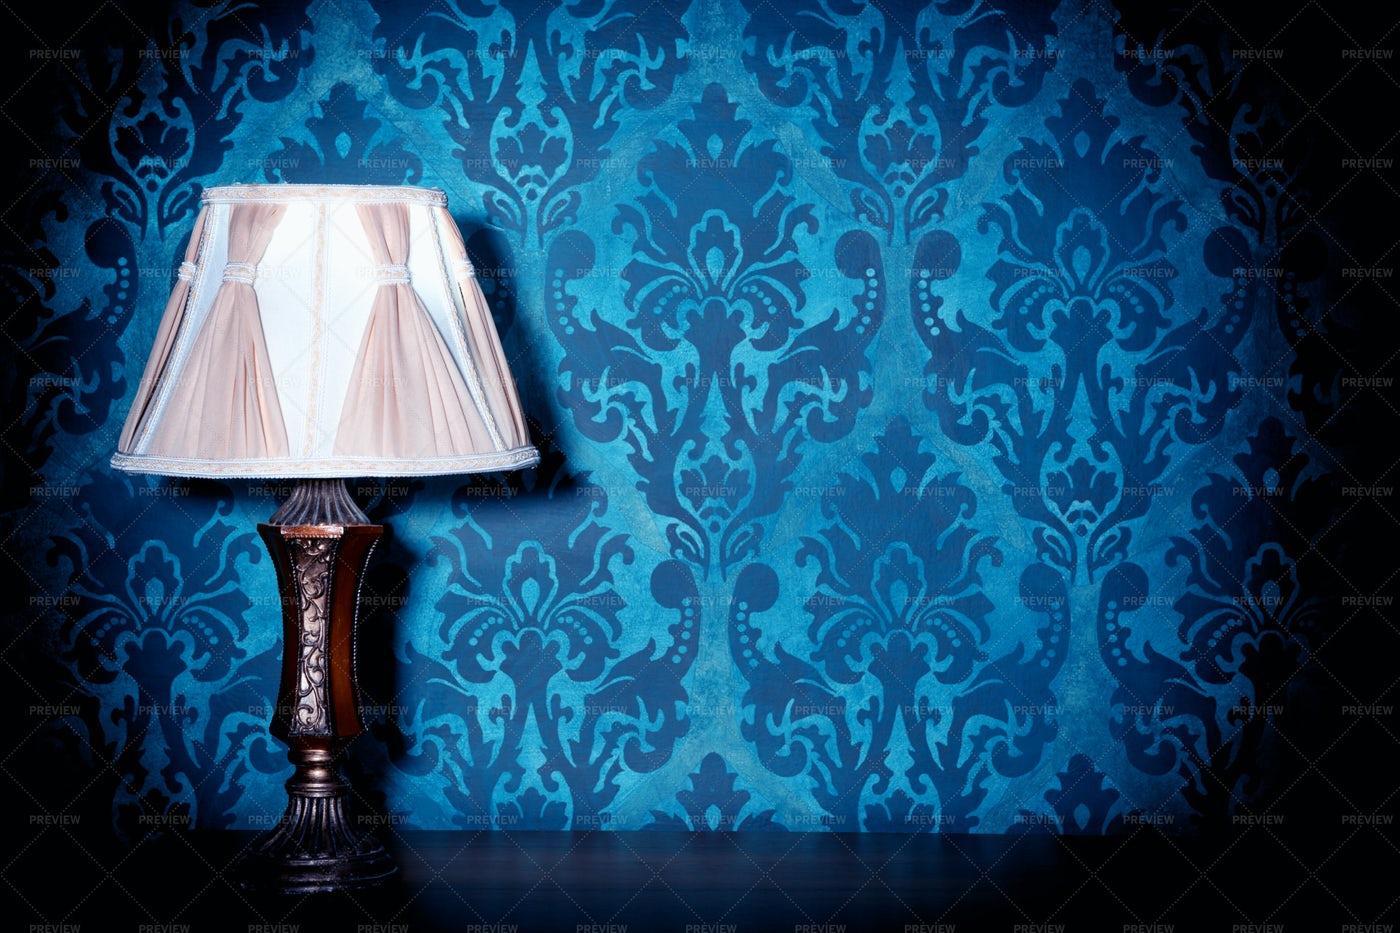 Blue Brocade Wallpaper Pattern: Stock Photos